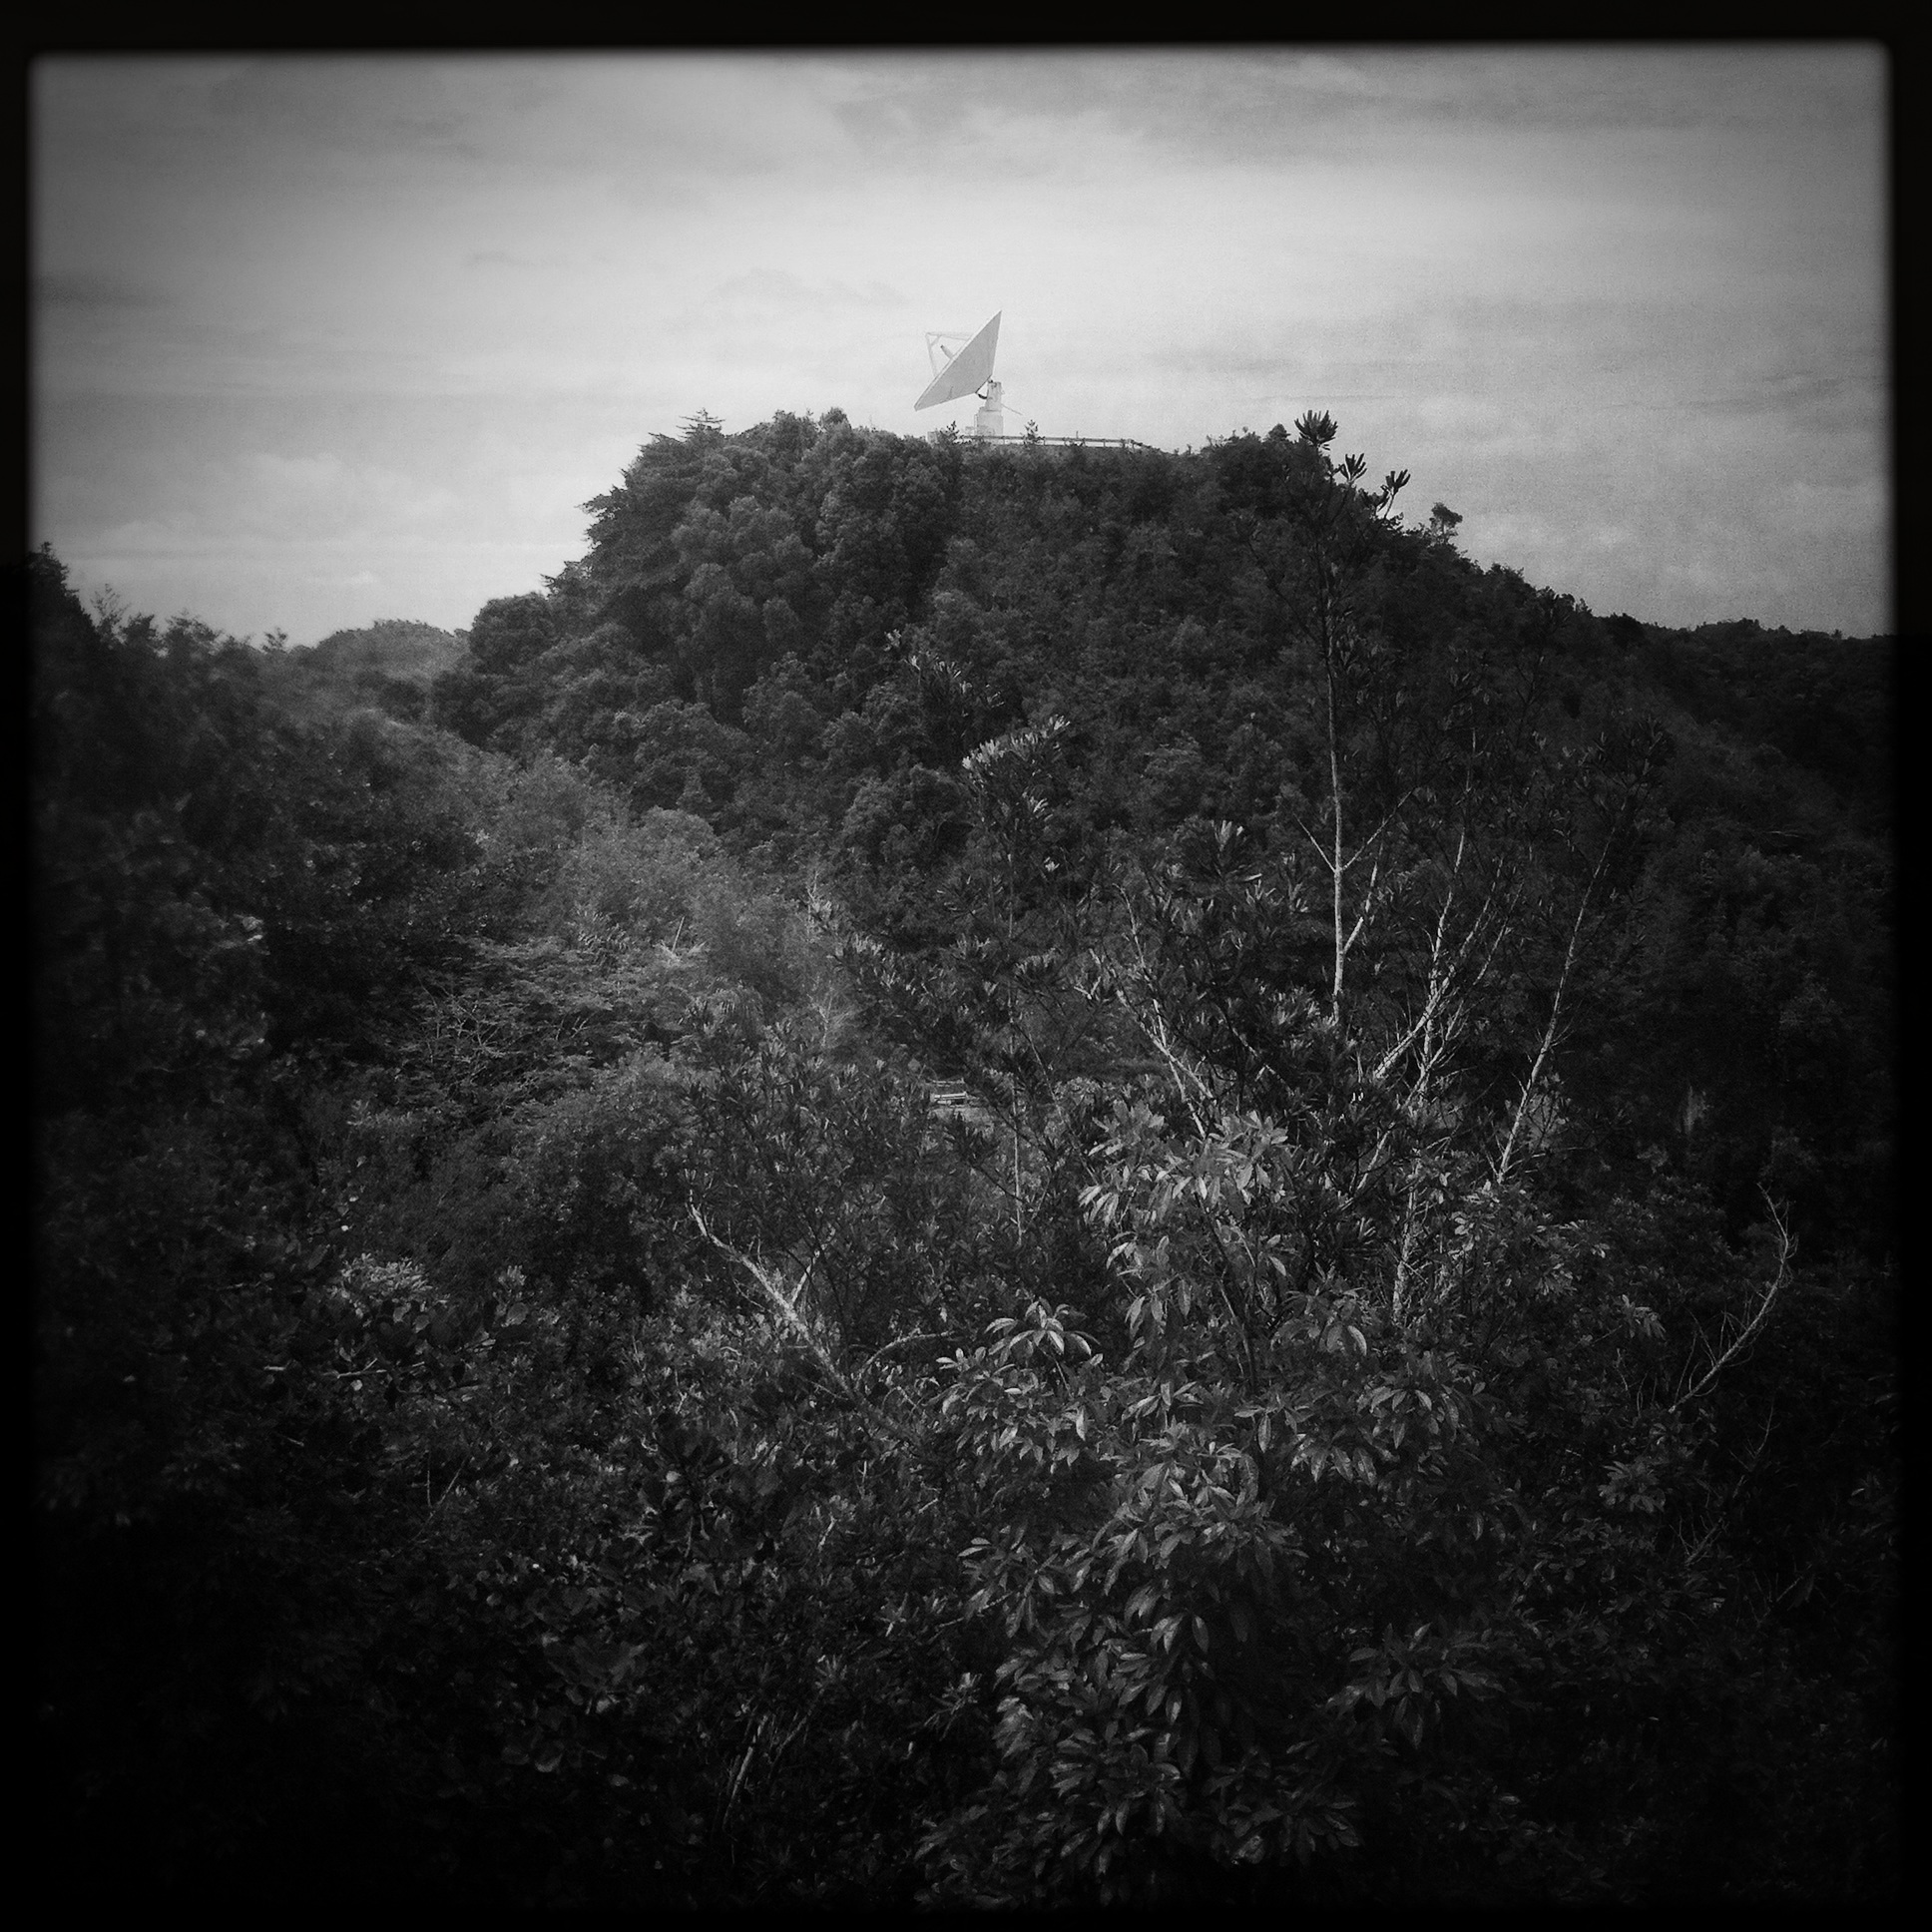 © Matt Hill  A little bonus shot of another radio telescope from Arecibo.